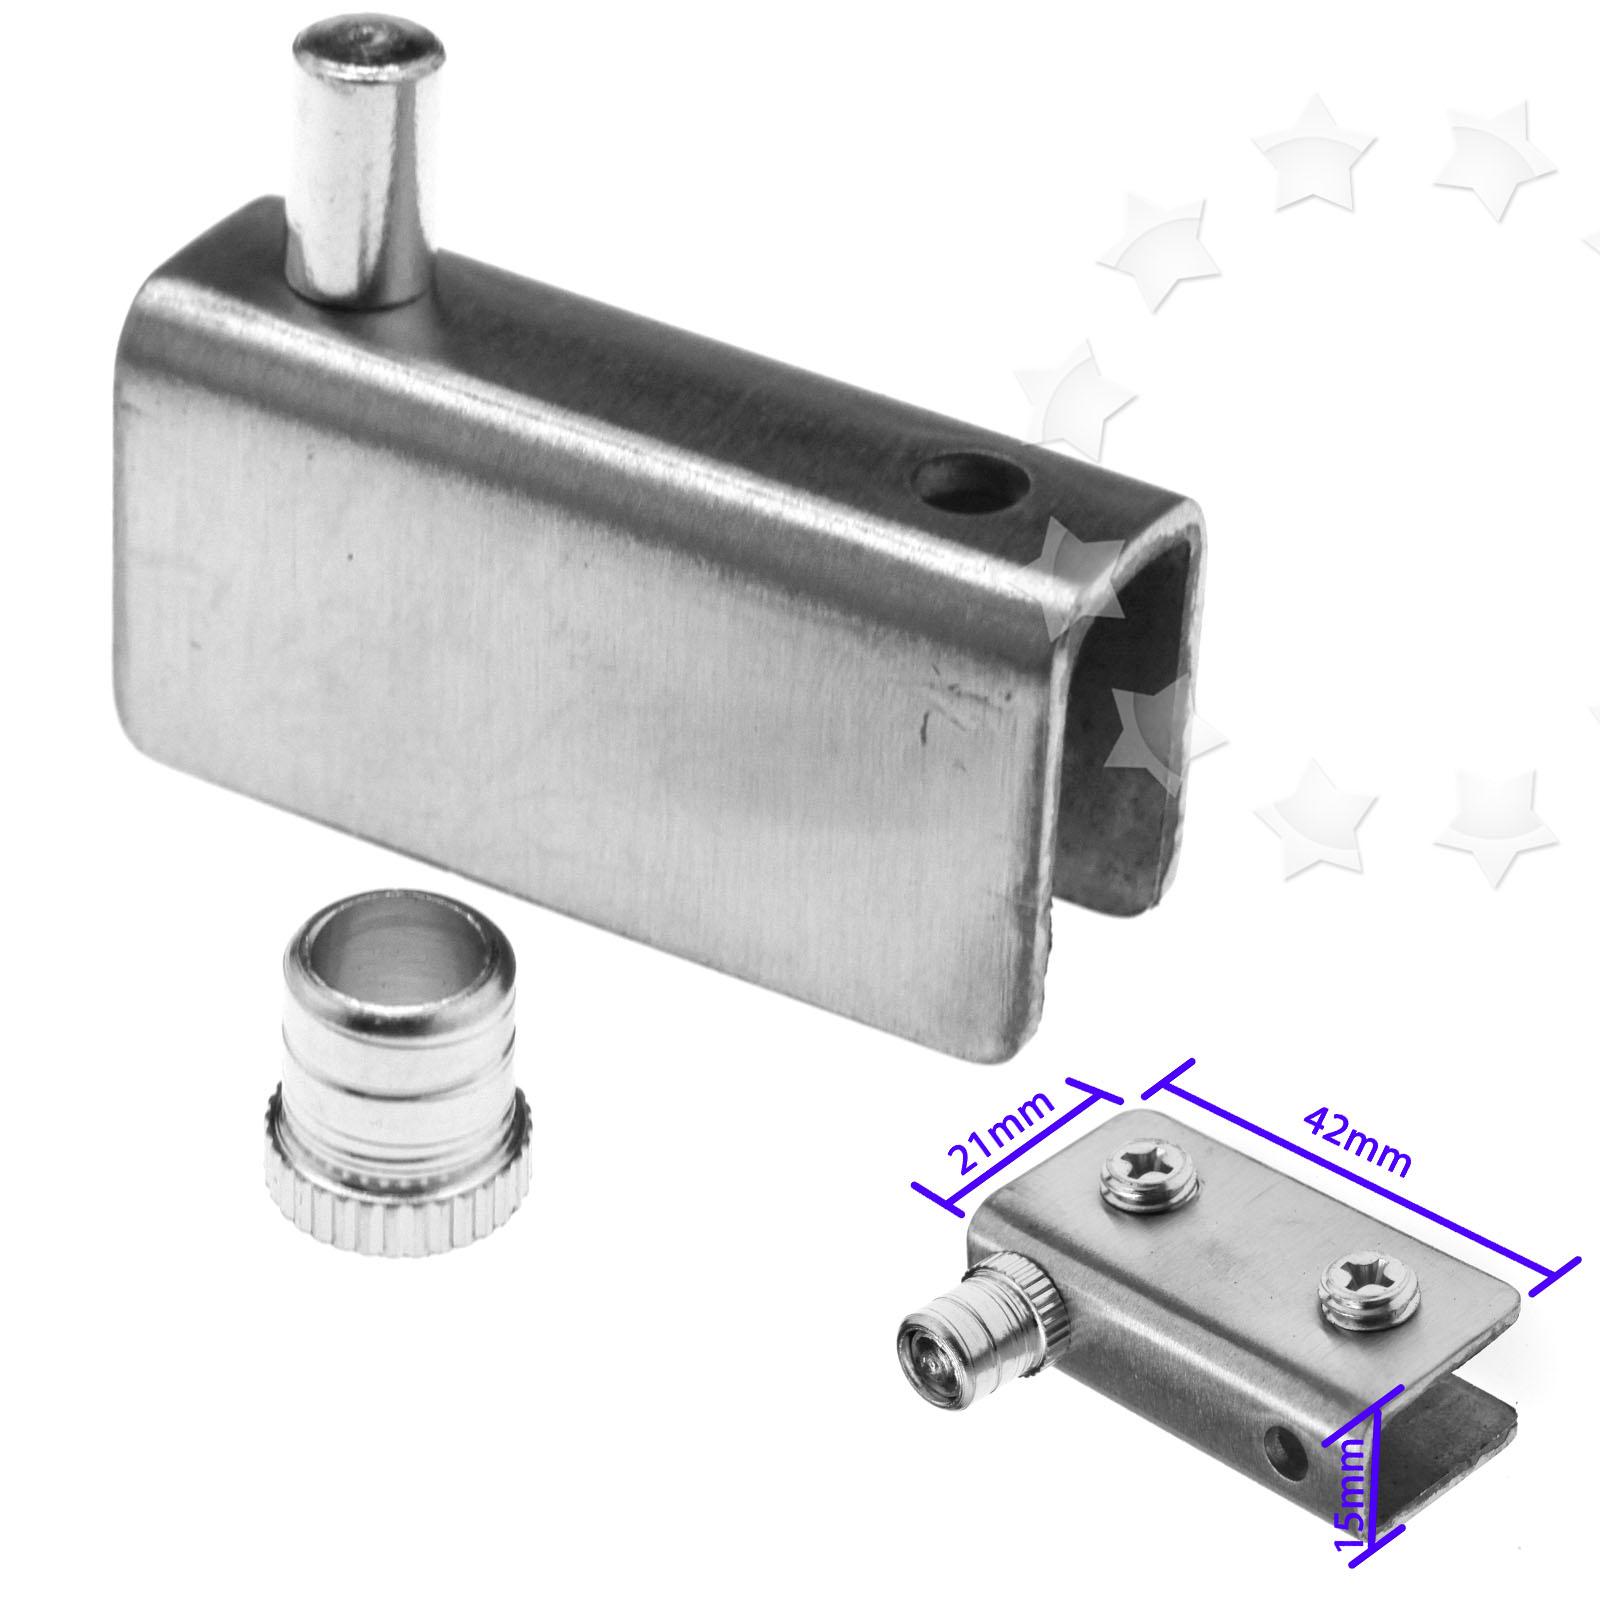 2 X Glass Door Pivot Hinge Set 304 Stainless Steel For 81012mm